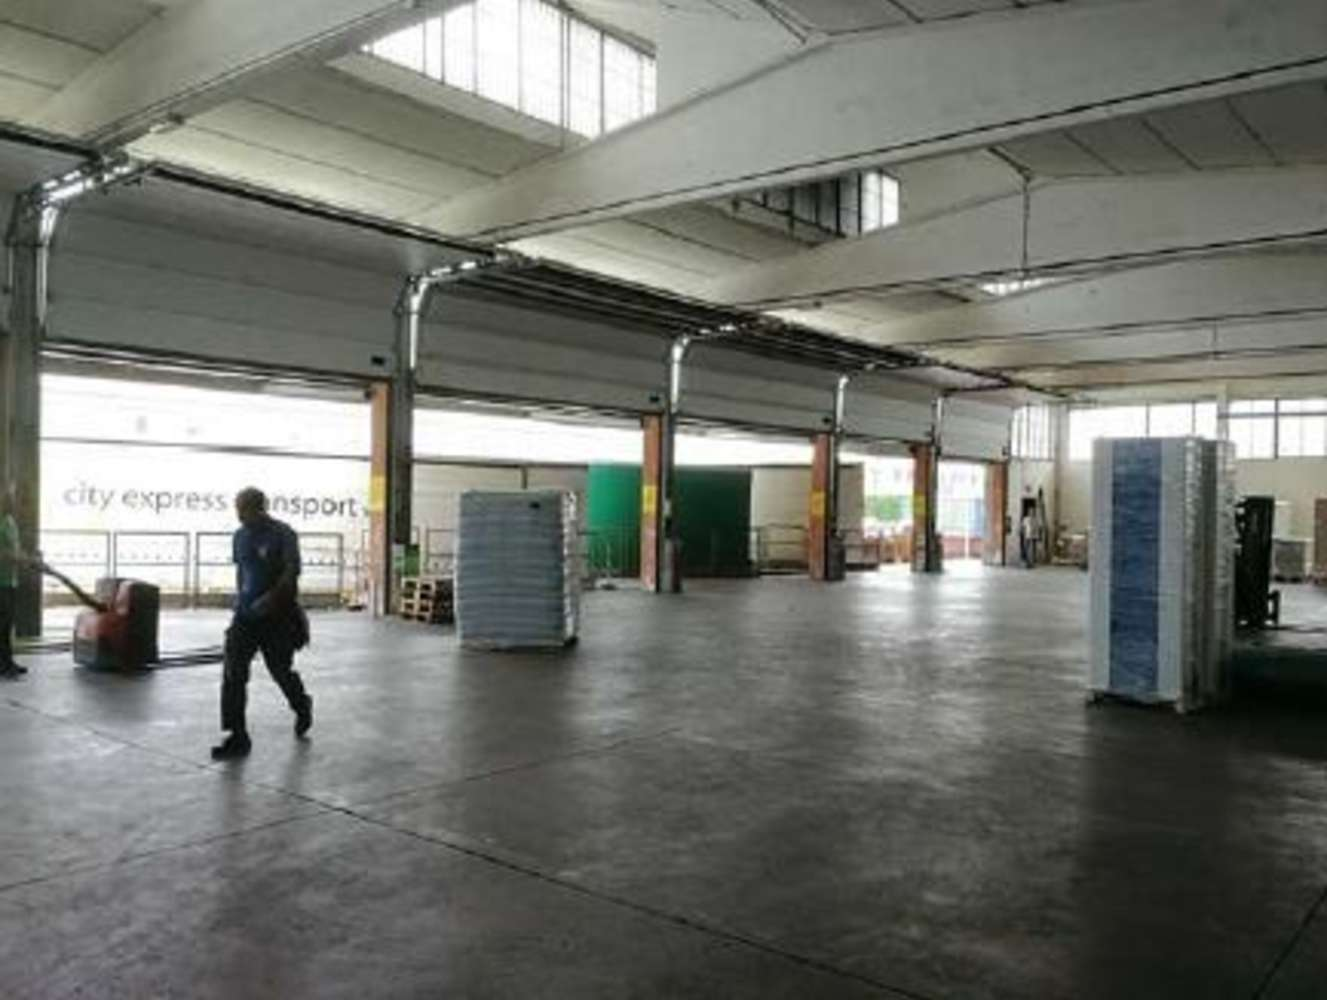 Magazzini industriali e logistici San giuliano milanese, 20098 - San Giuliano Milanese